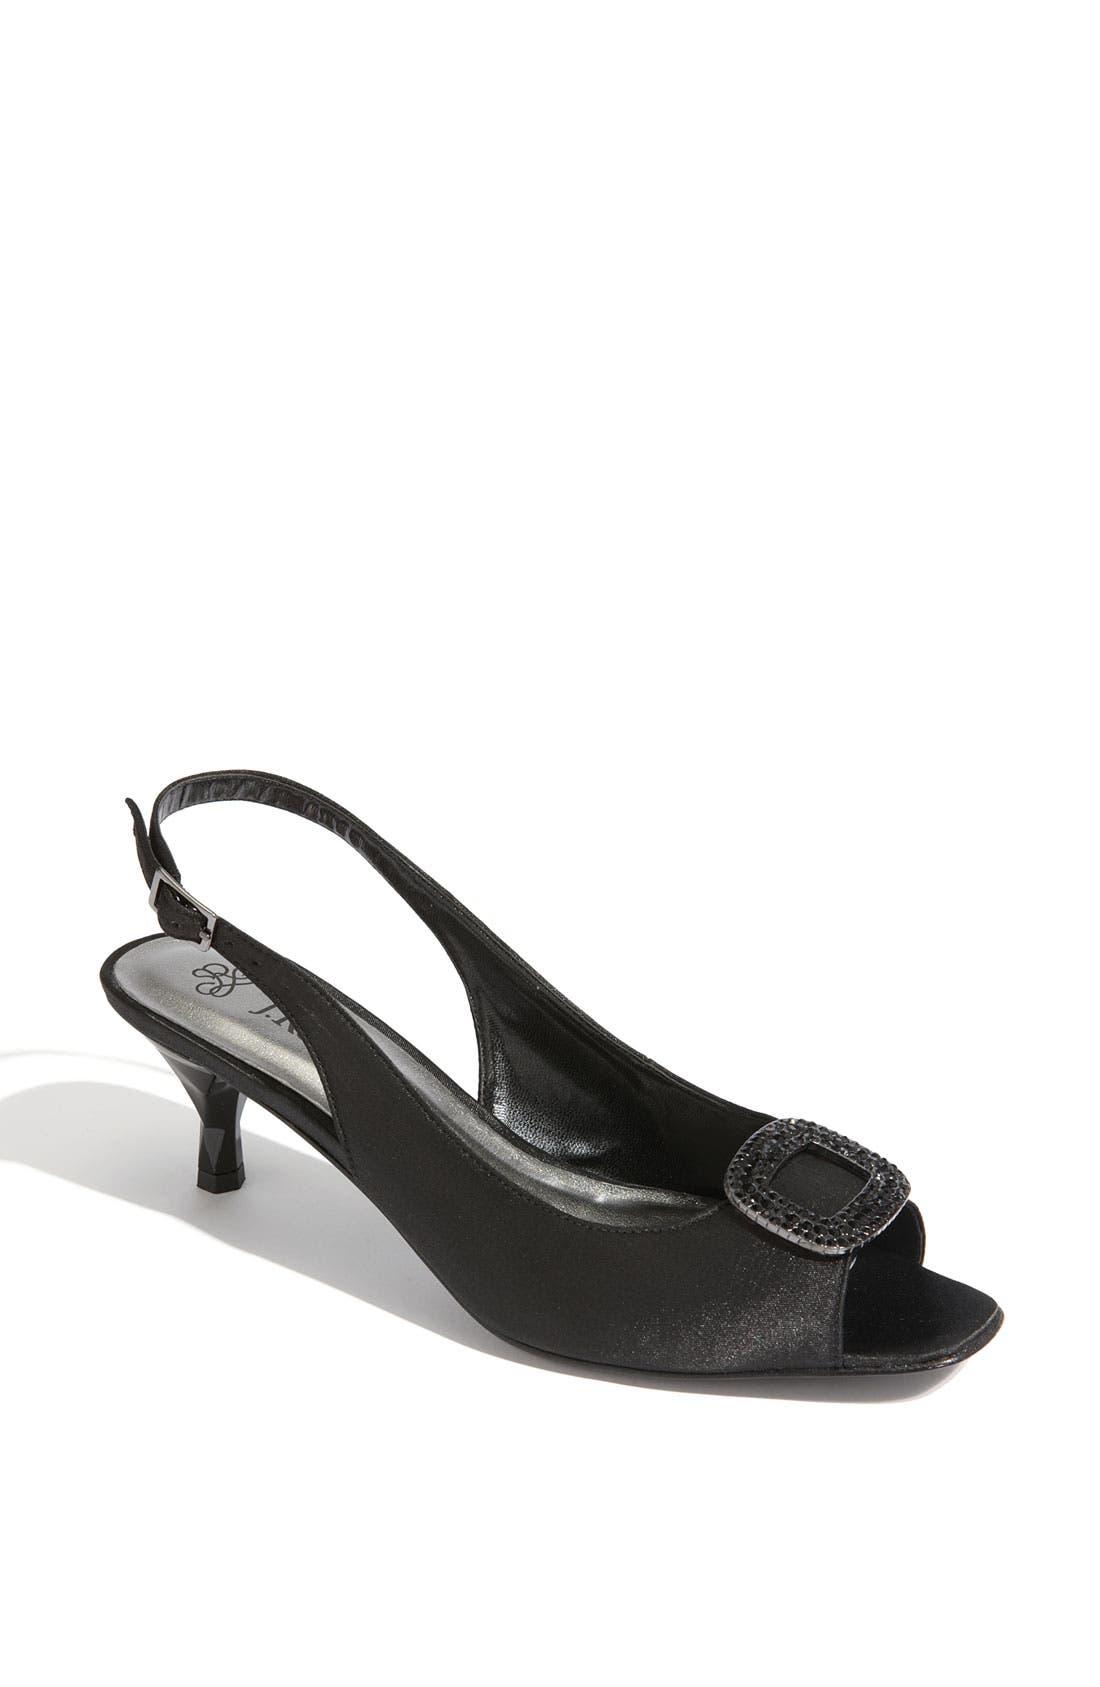 Main Image - J. Reneé 'Classic' Sandal